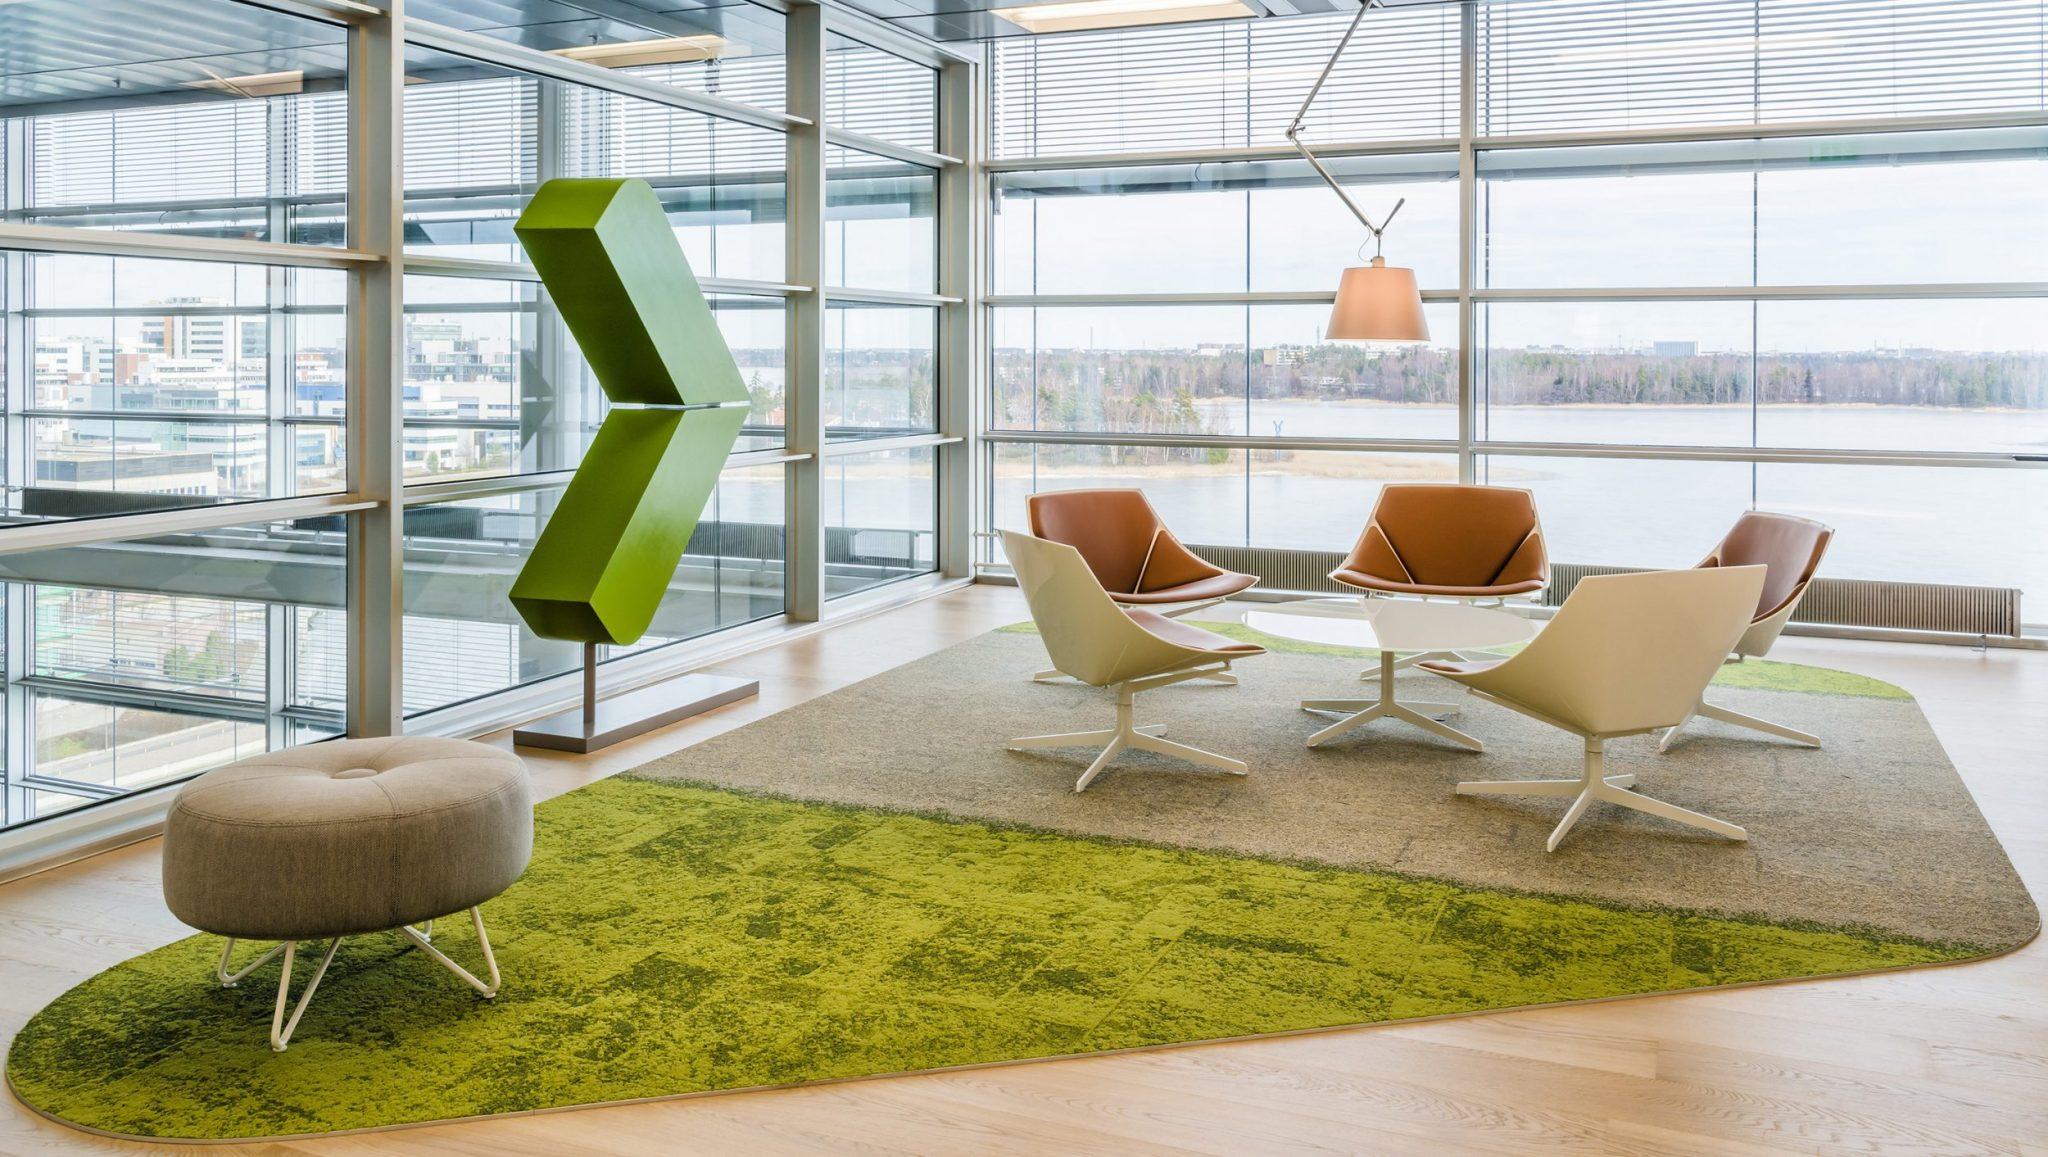 Valmet-Espoo-GI-Project-3